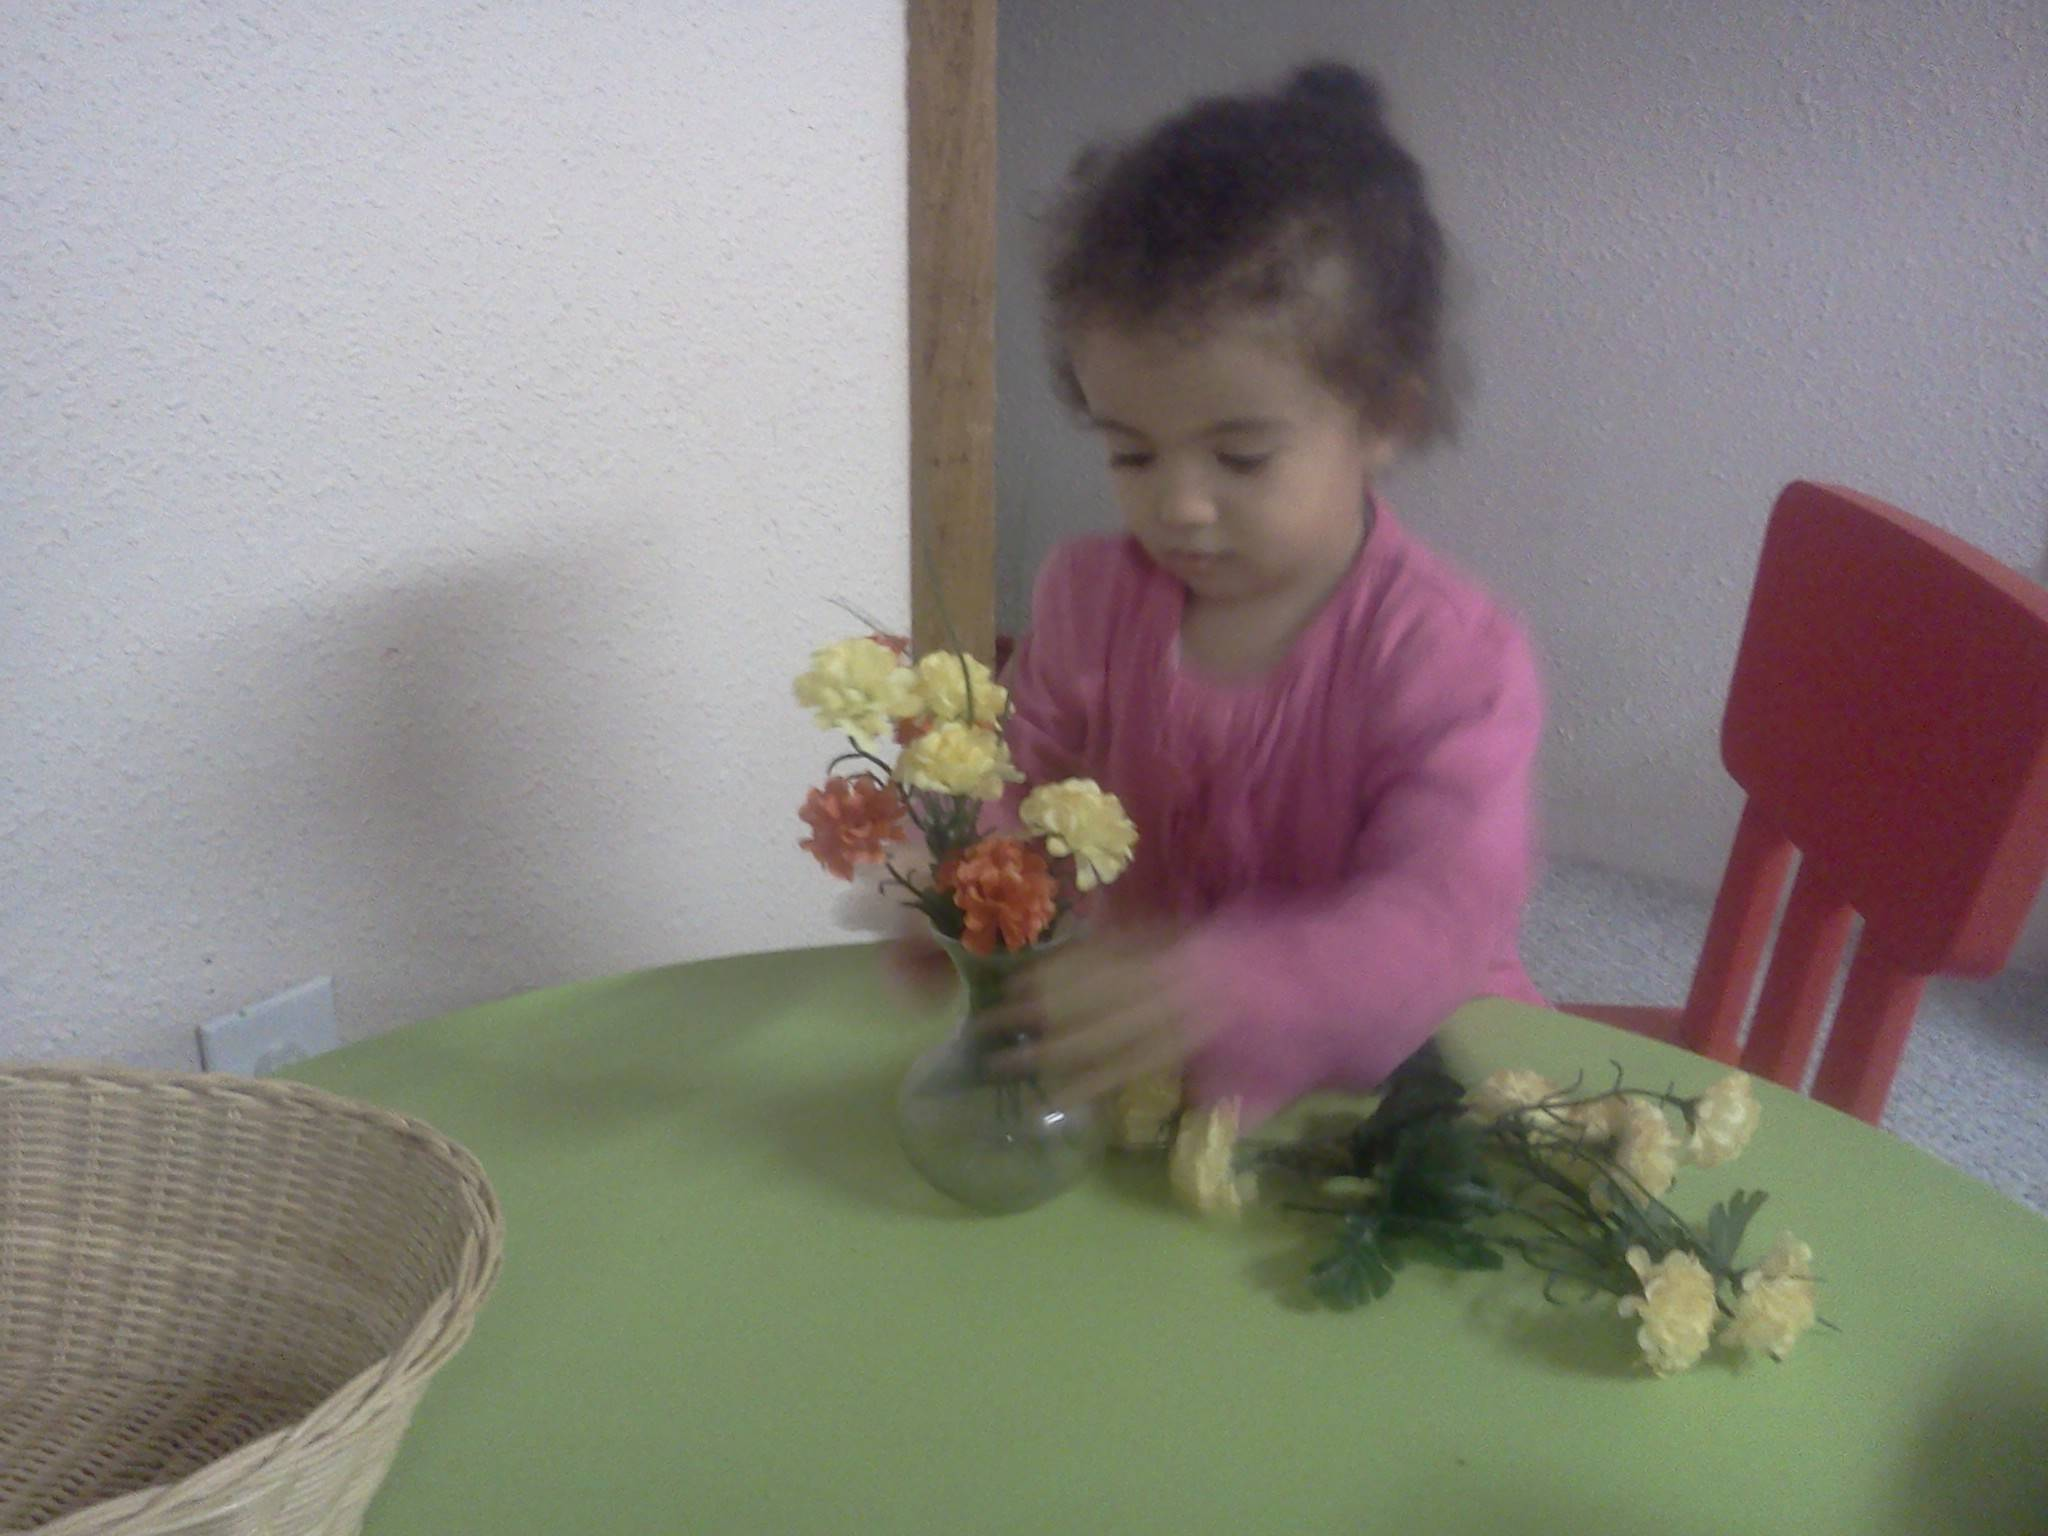 Flower Arranging activity